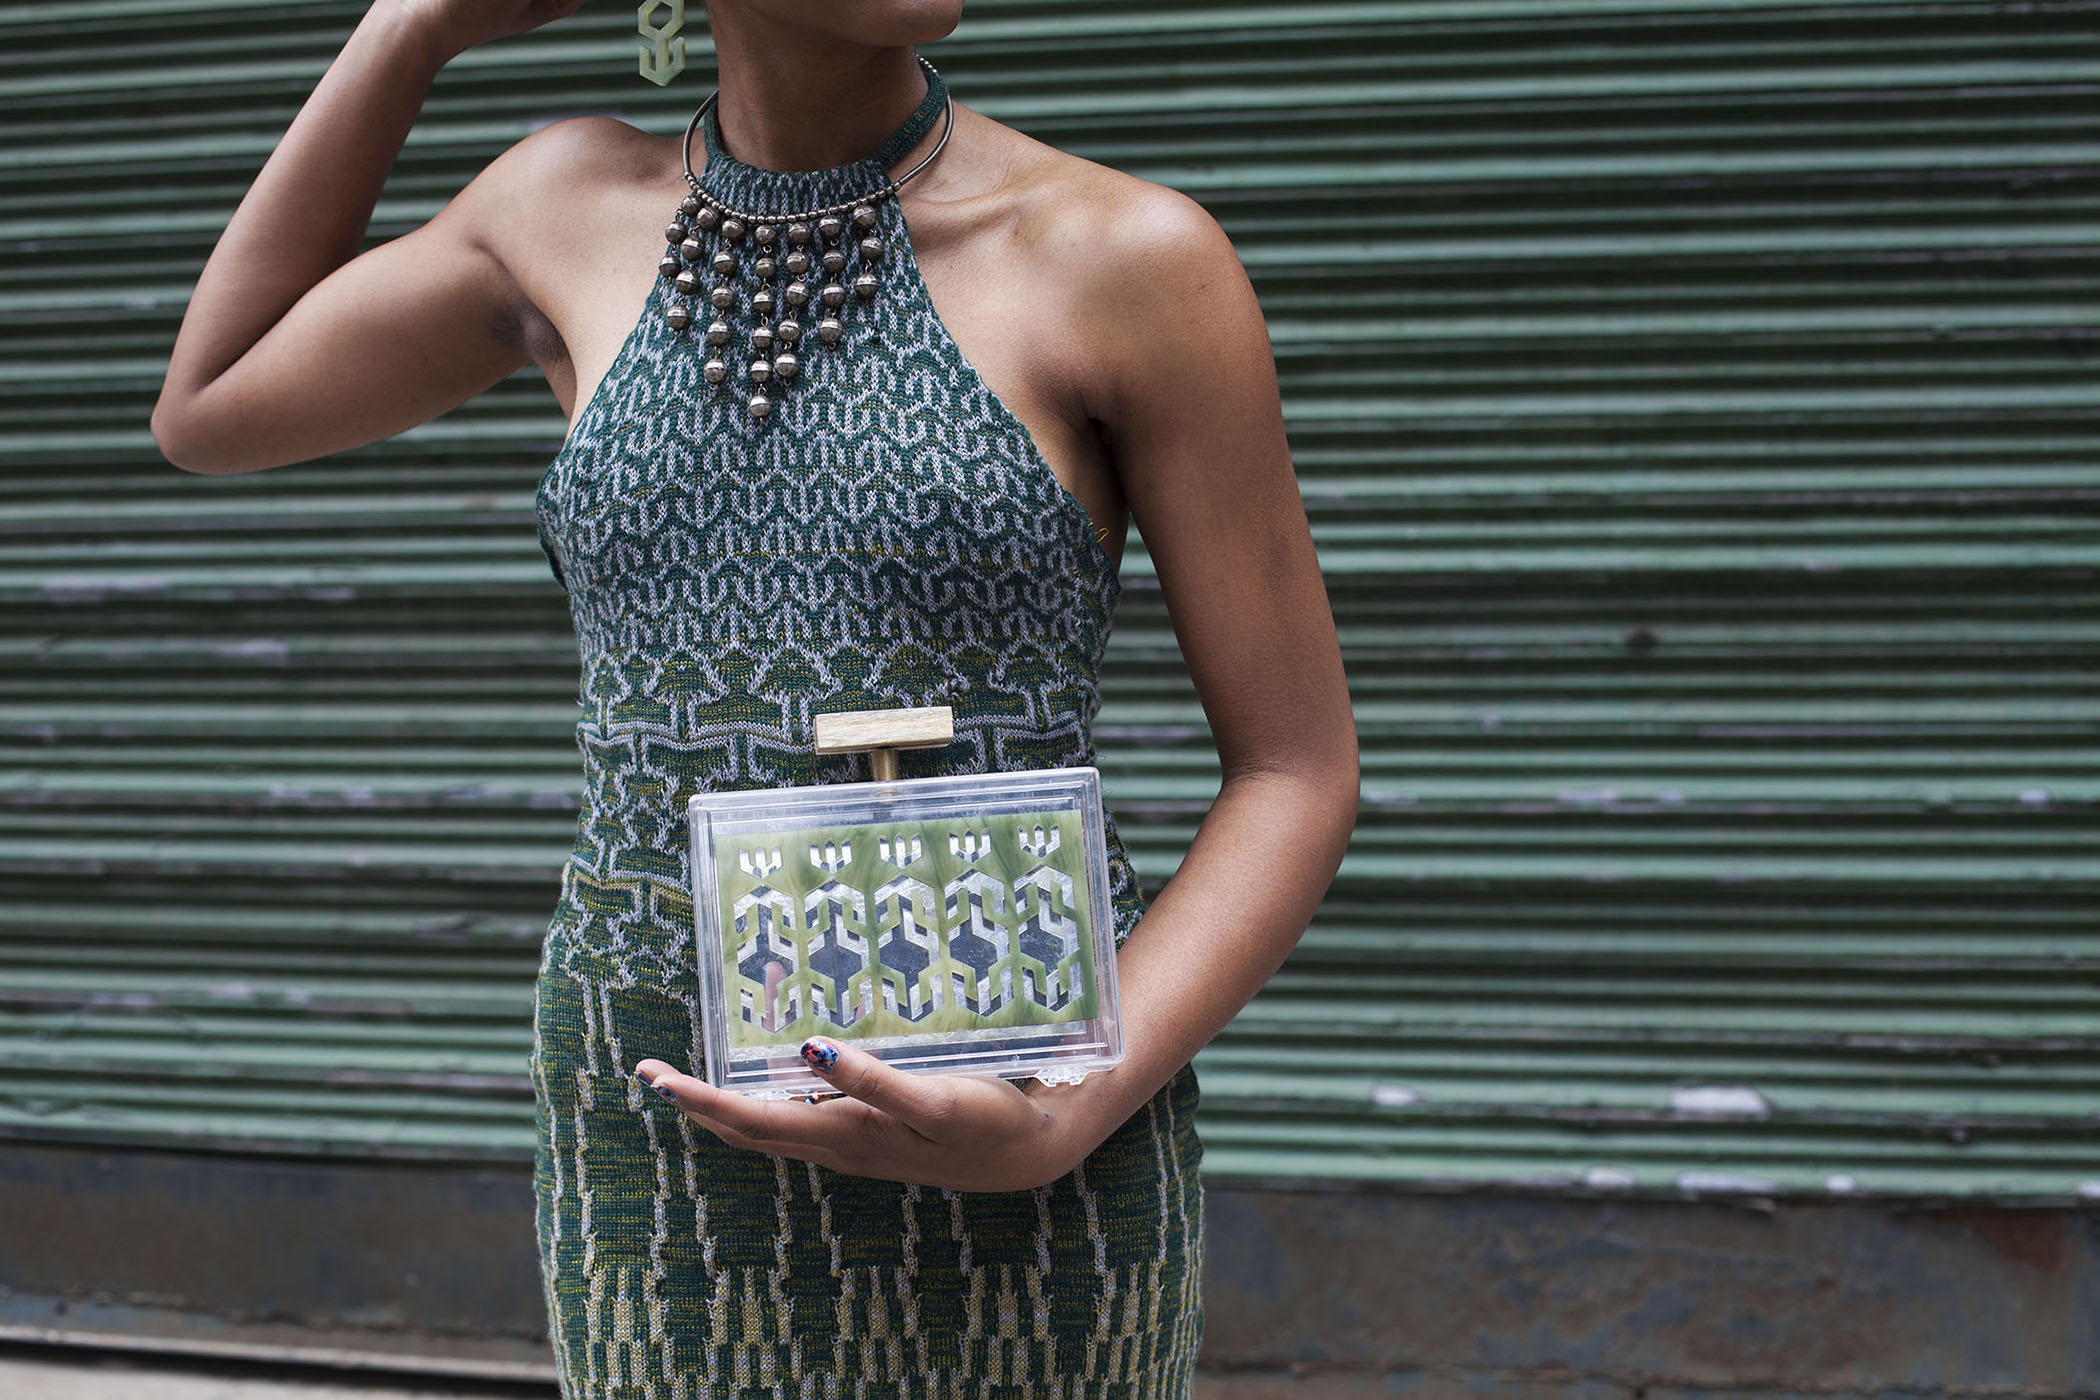 Merino Wool Machine Knit Jacquard Dress  Laser Cut Plexi Glass Clutch and Earrings